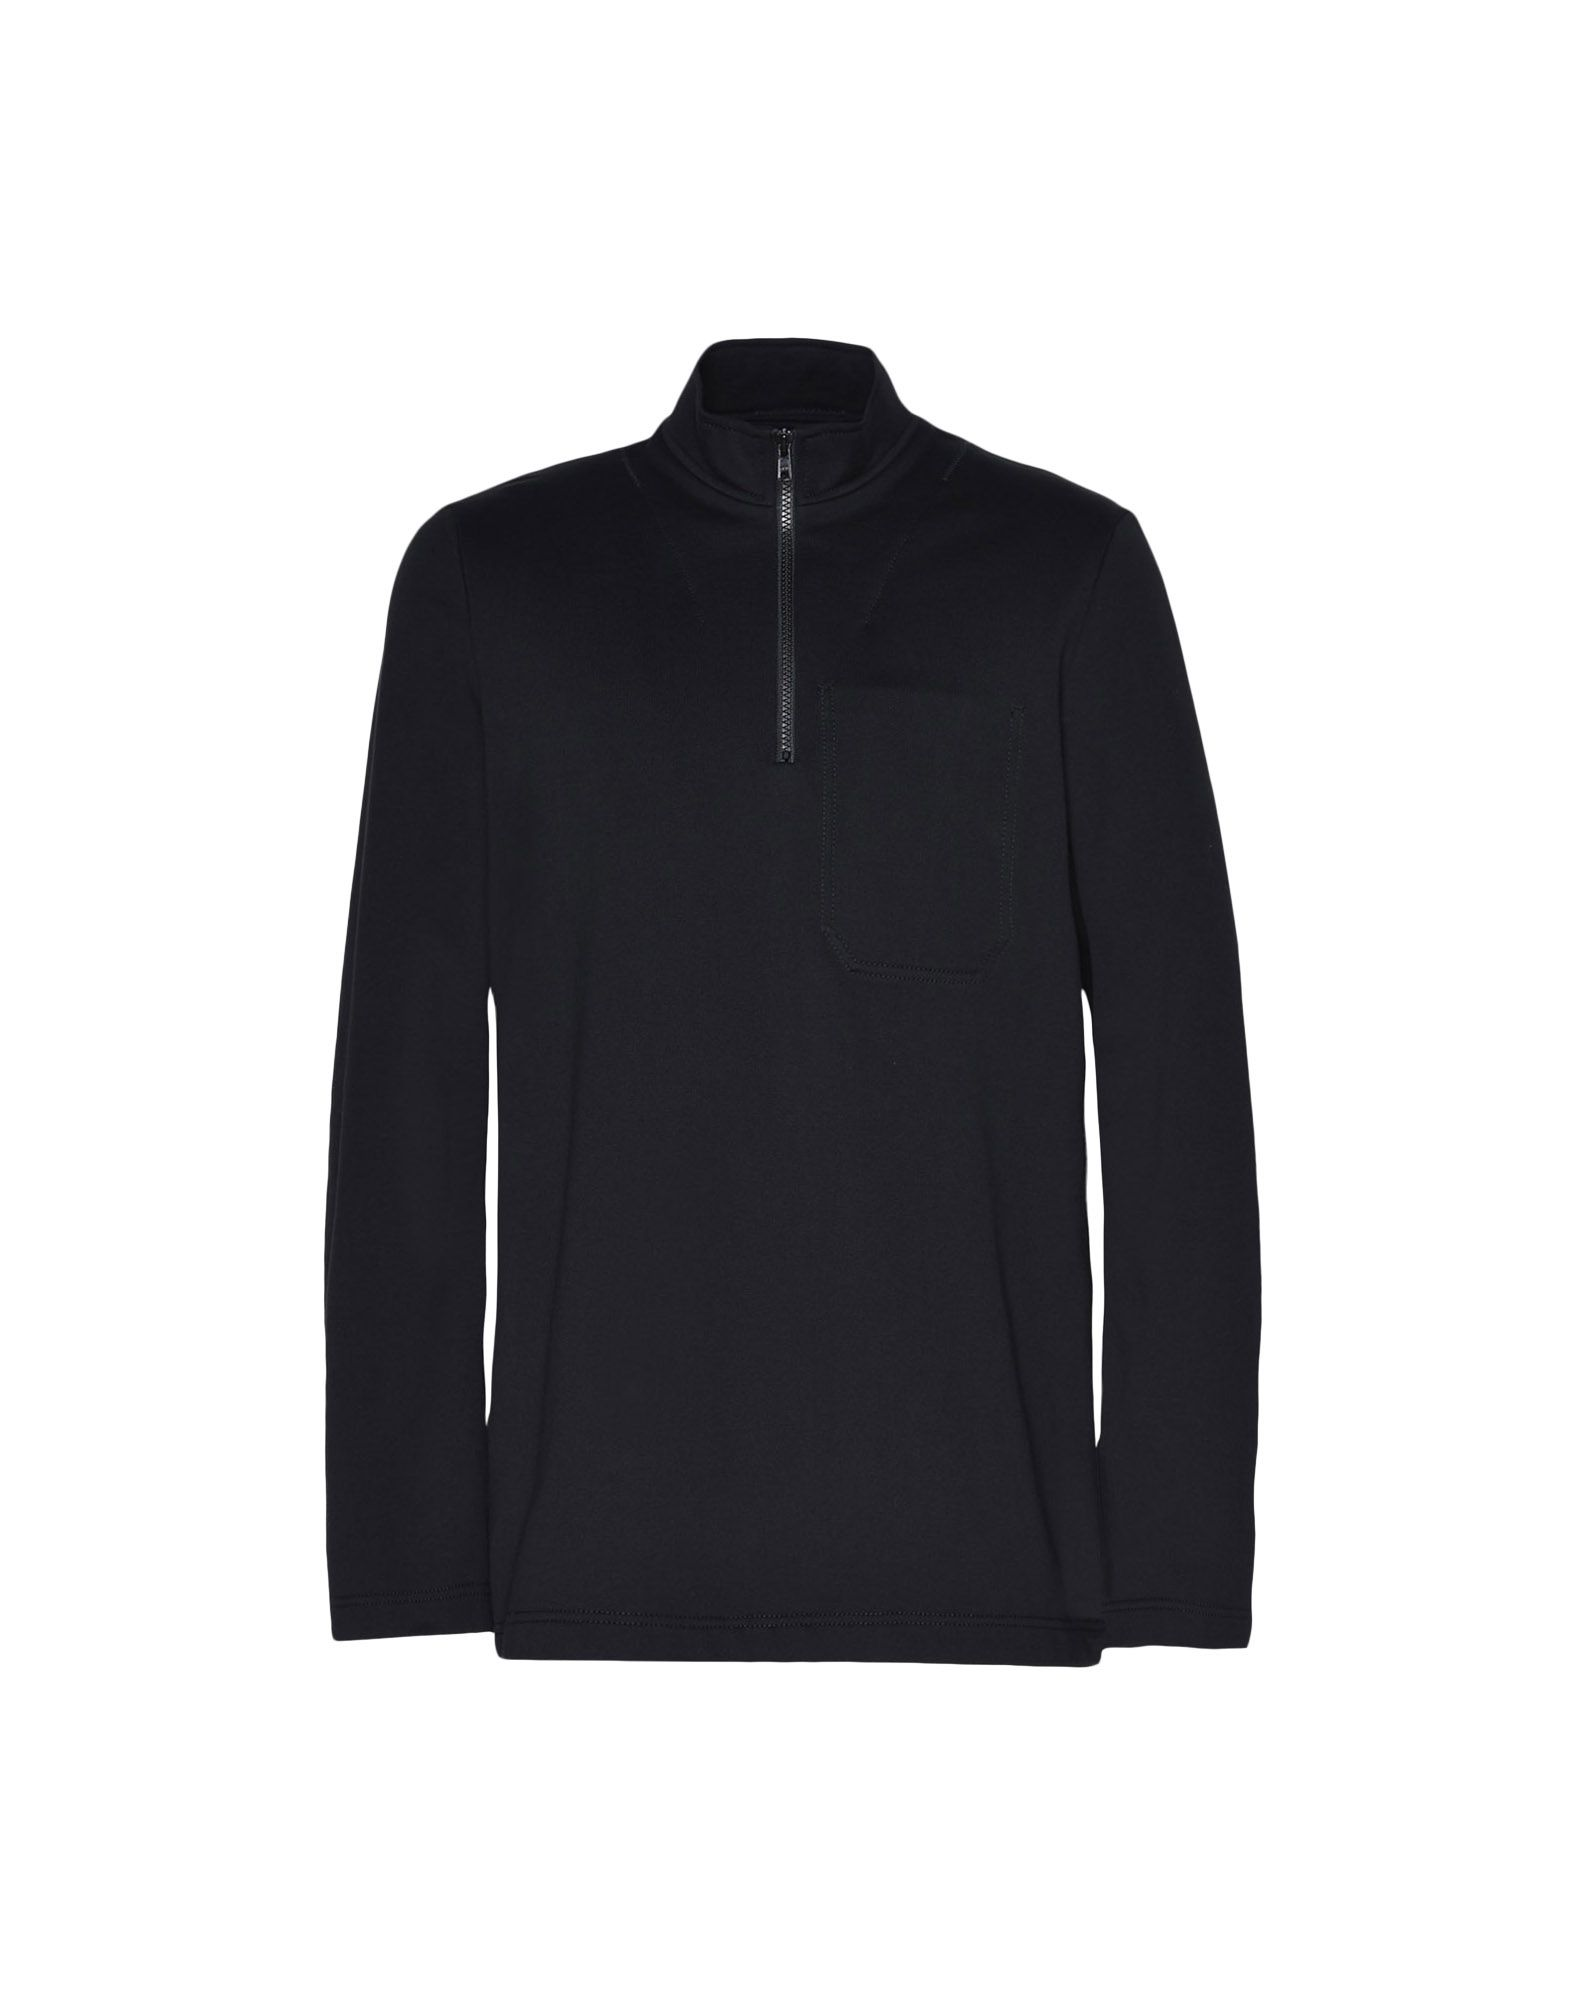 Y-3 Y-3 Sashiko Sweater Sweatshirt mit Zipp Herren f